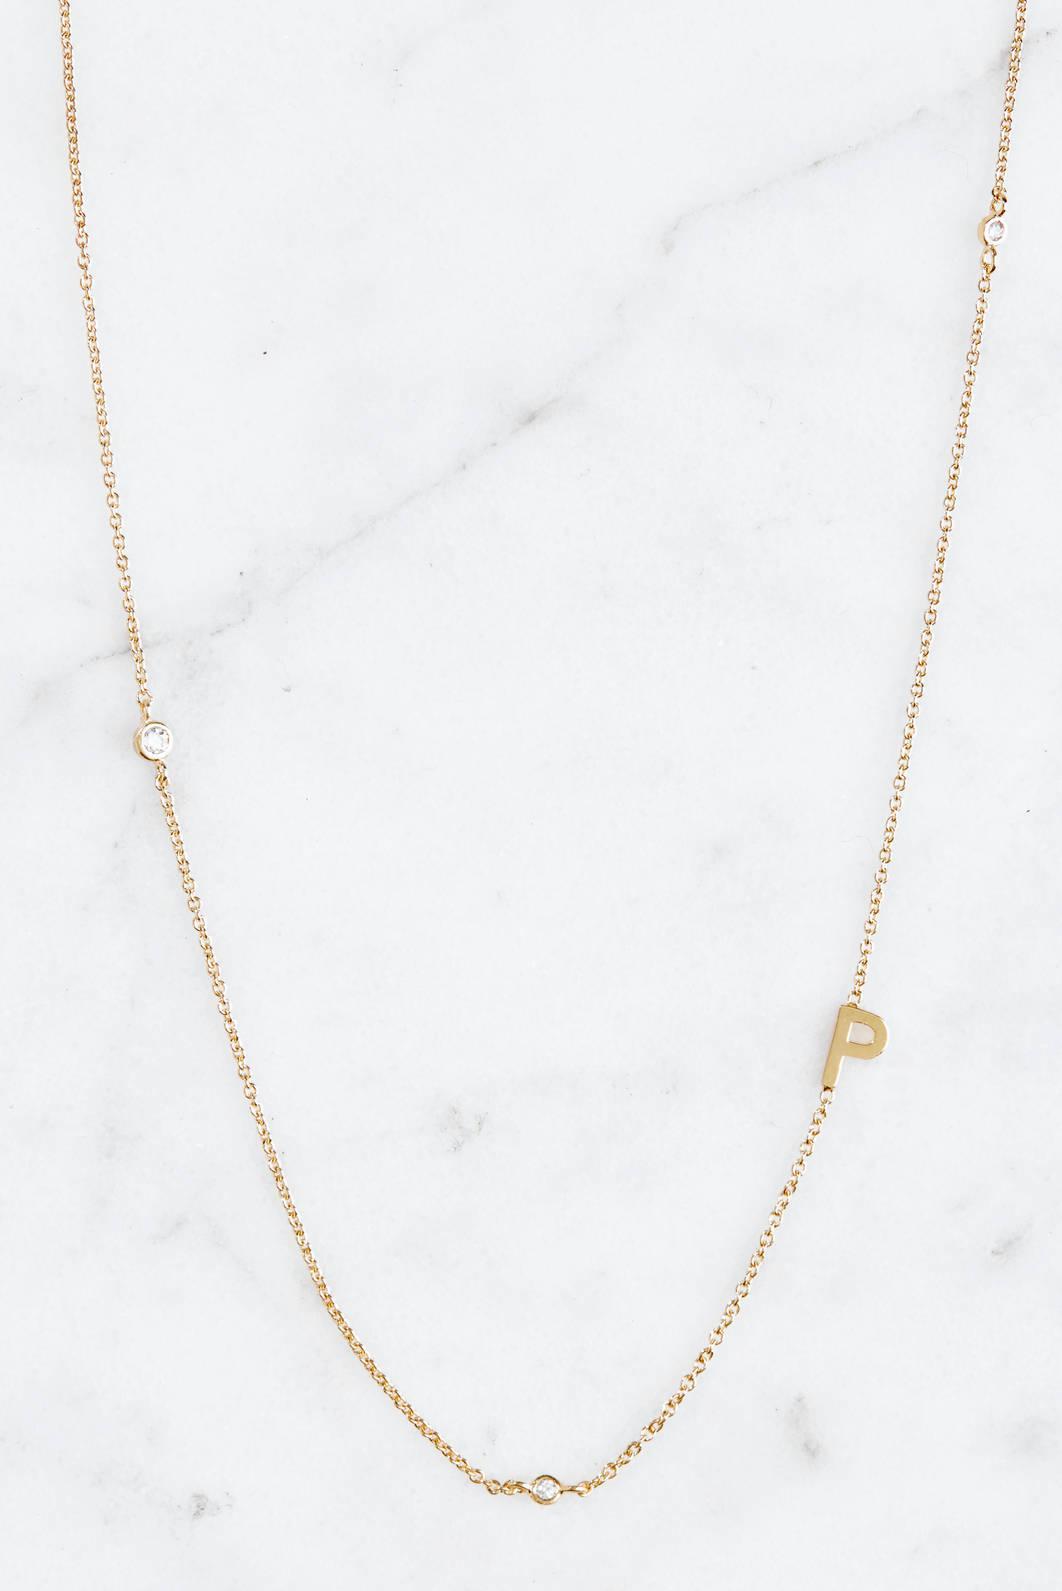 Tai Jewelry Gold Alphabet Necklace N Gold Qo7XWuVF6